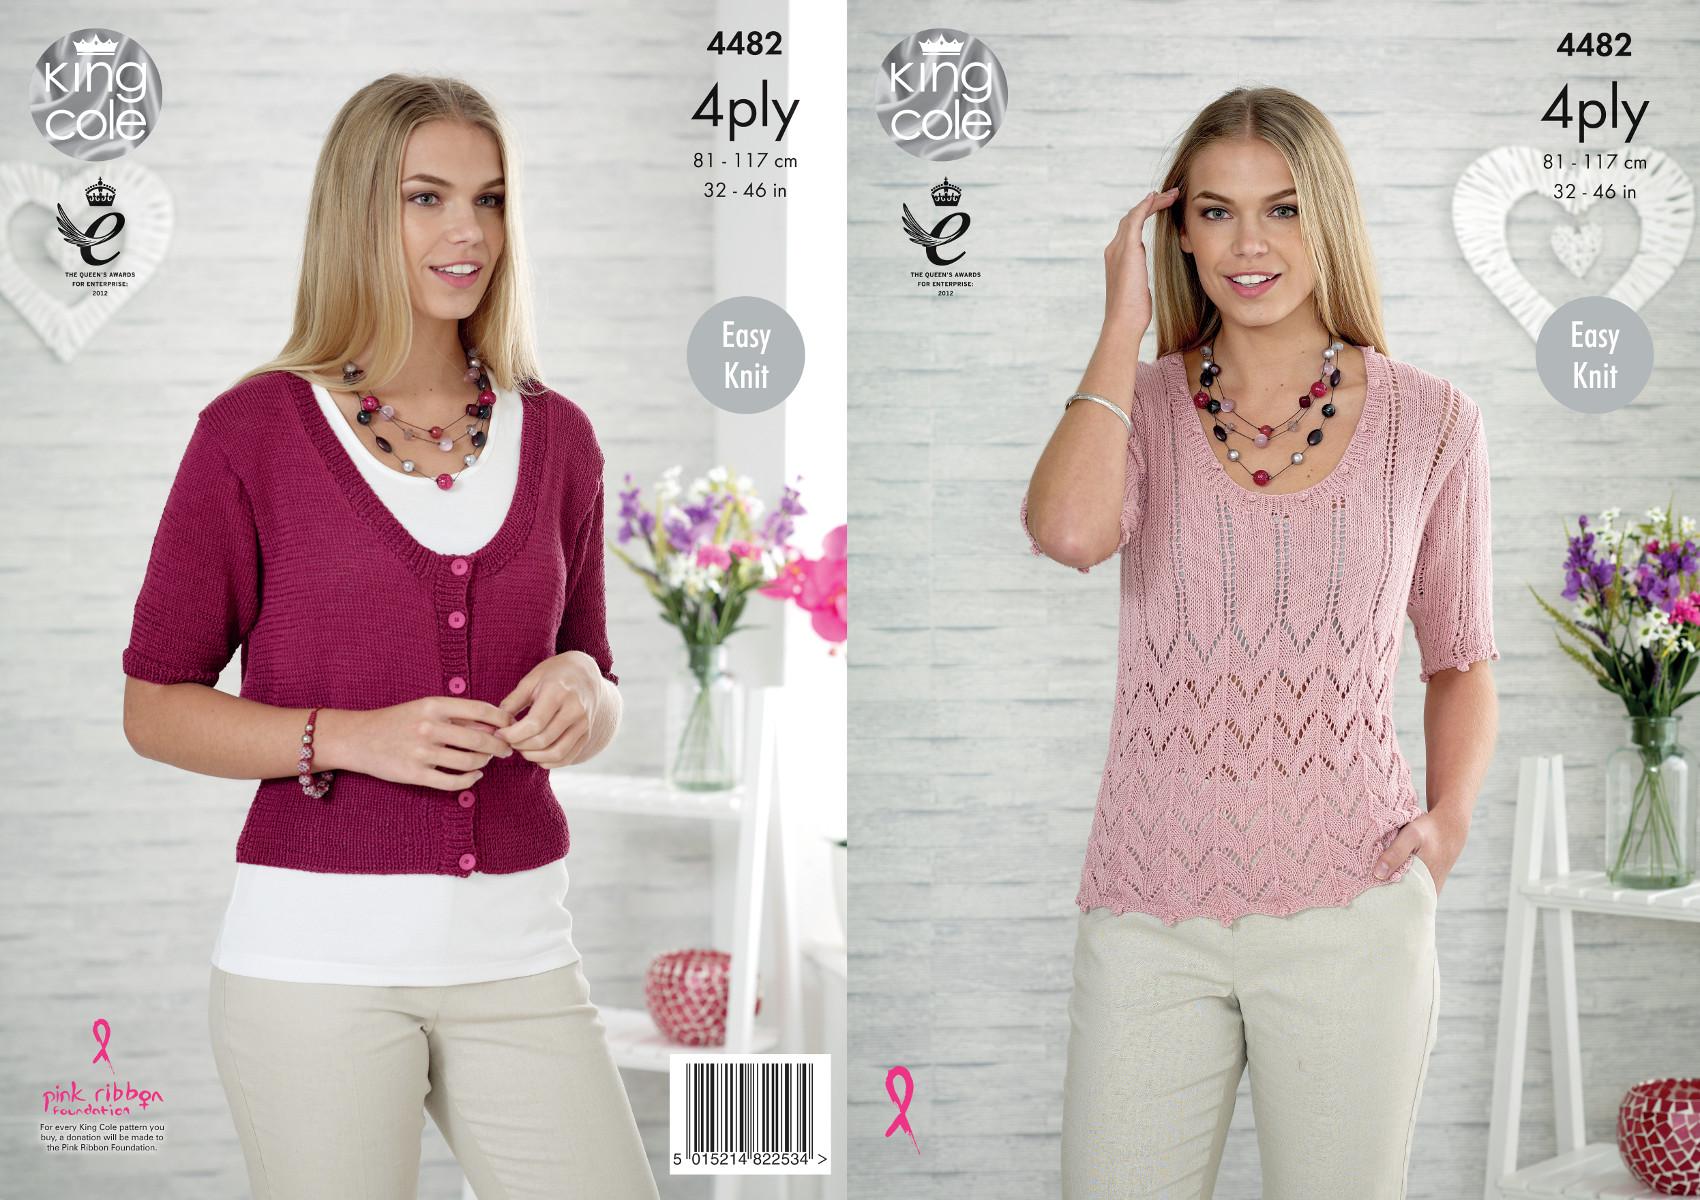 King Cole Ladies Cardigan Knitting Pattern : Womens Lace Top & Cardigan Knitting Pattern King Cole Ladies Easy Knit 4p...